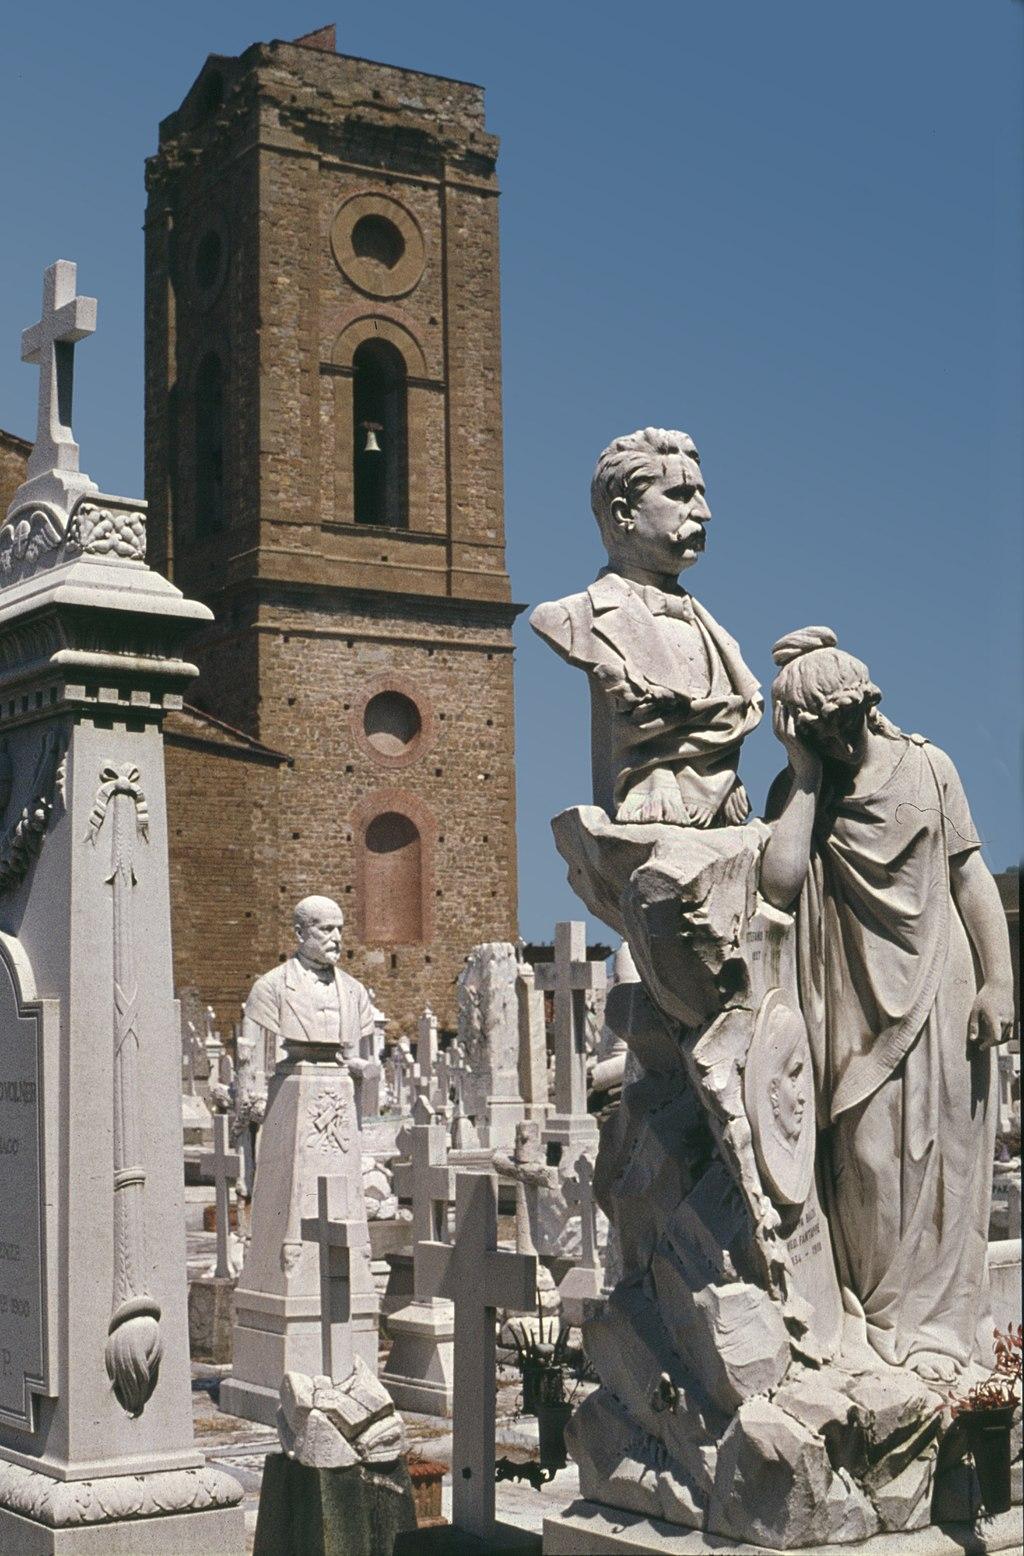 Florenz-42-Friedhof von San Miniato al Monte-Grabmal-1977-gje